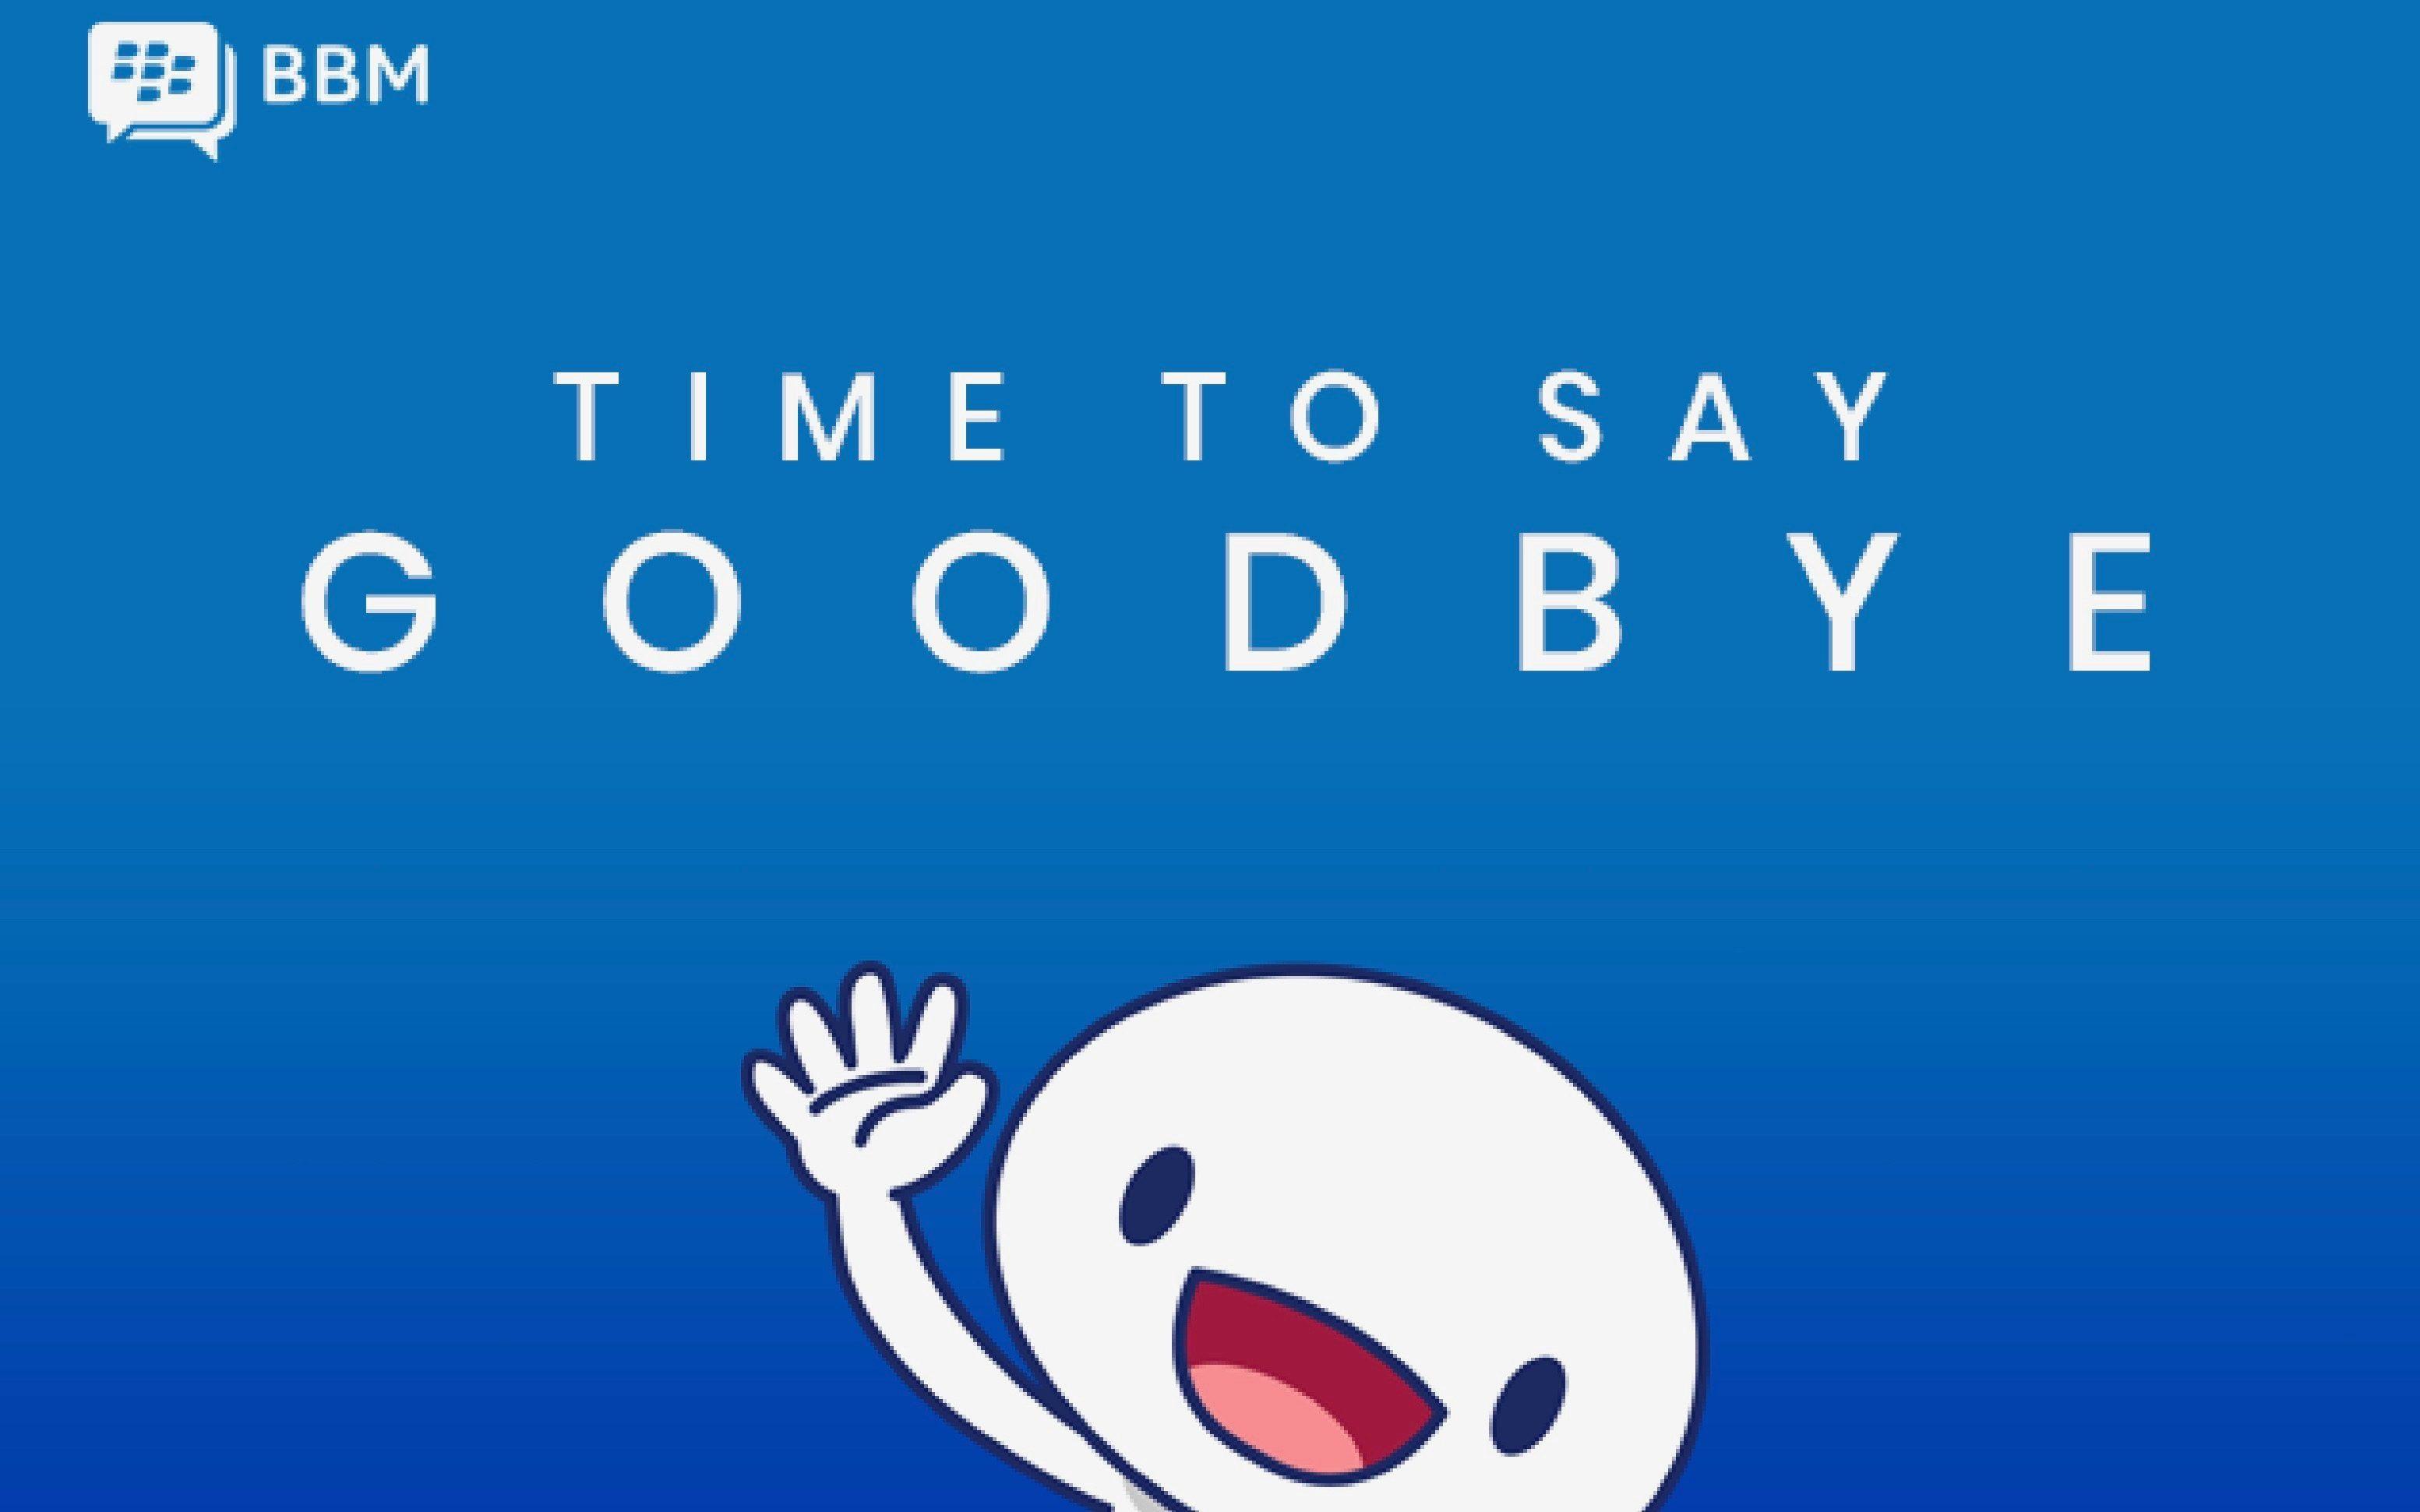 BlackBerry Messenger shutting down next month, new iOS app